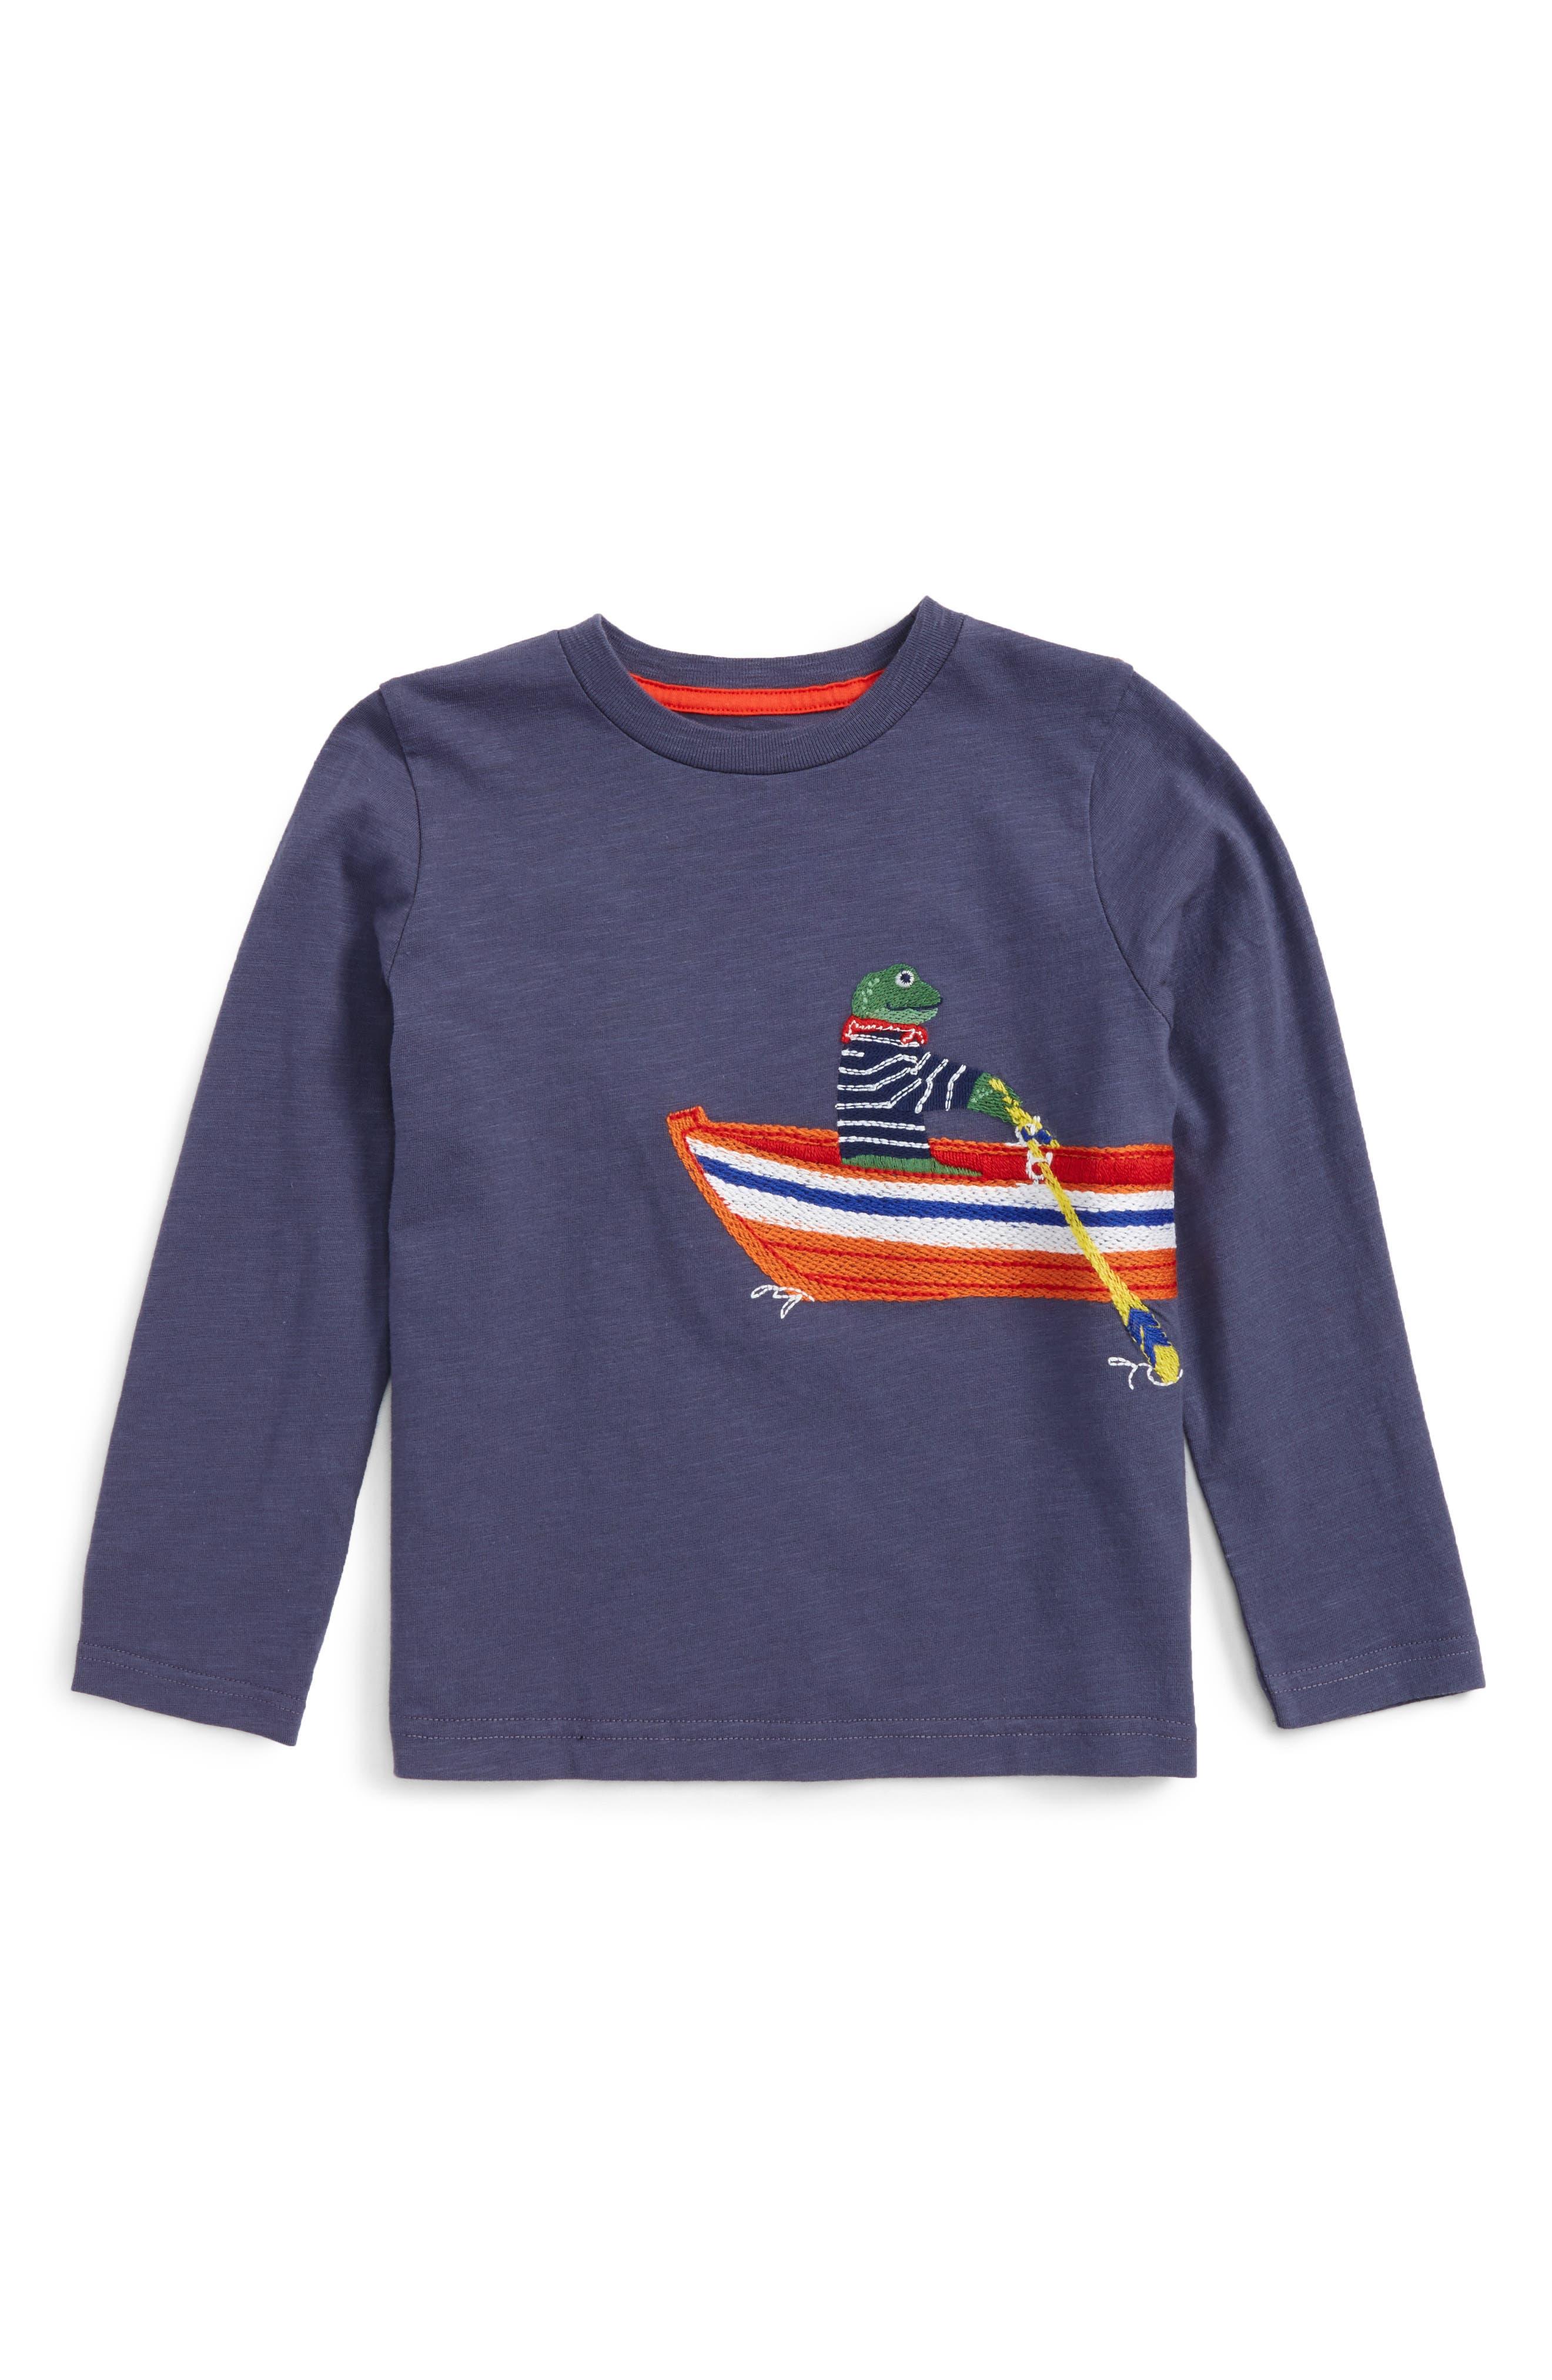 Alternate Image 1 Selected - Mini Boden Superstitch T-Shirt (Toddler Boys, Little Boys & Big Boys)